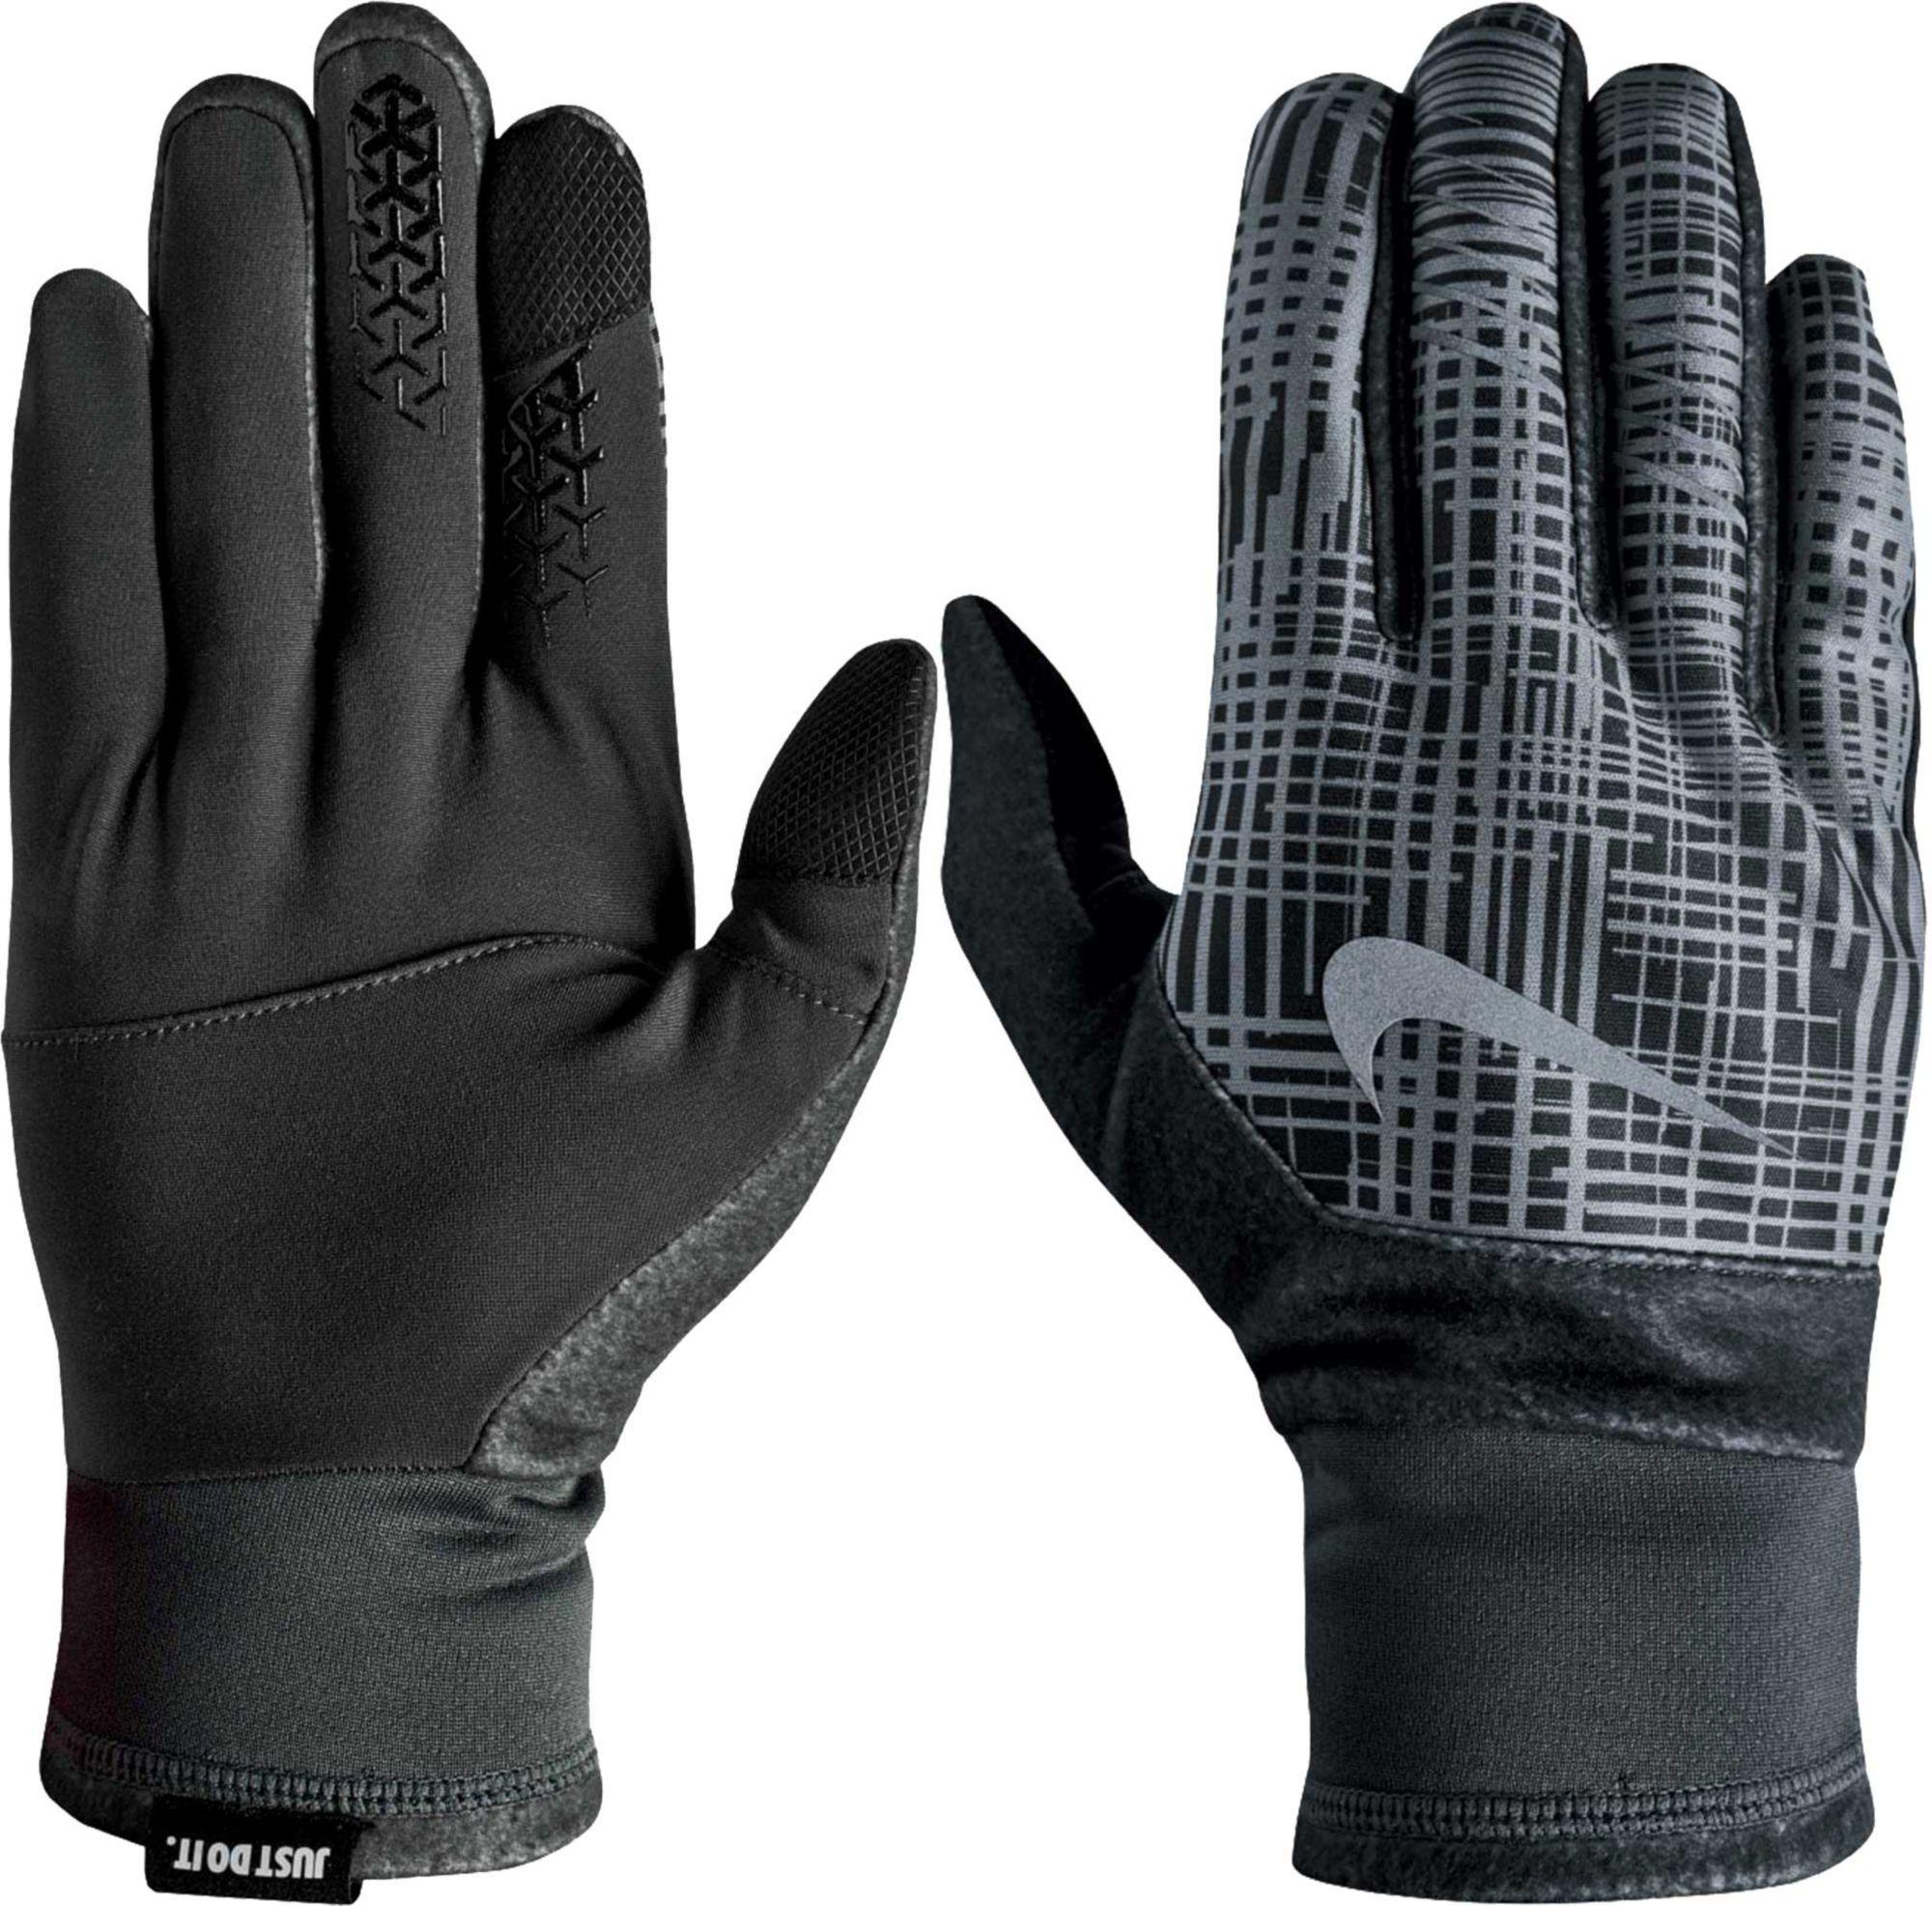 Nike Men's Printed Therma-FIT Elite Run Gloves 2.0. 0:00. 0:00 / 0:00.  noImageFound ???